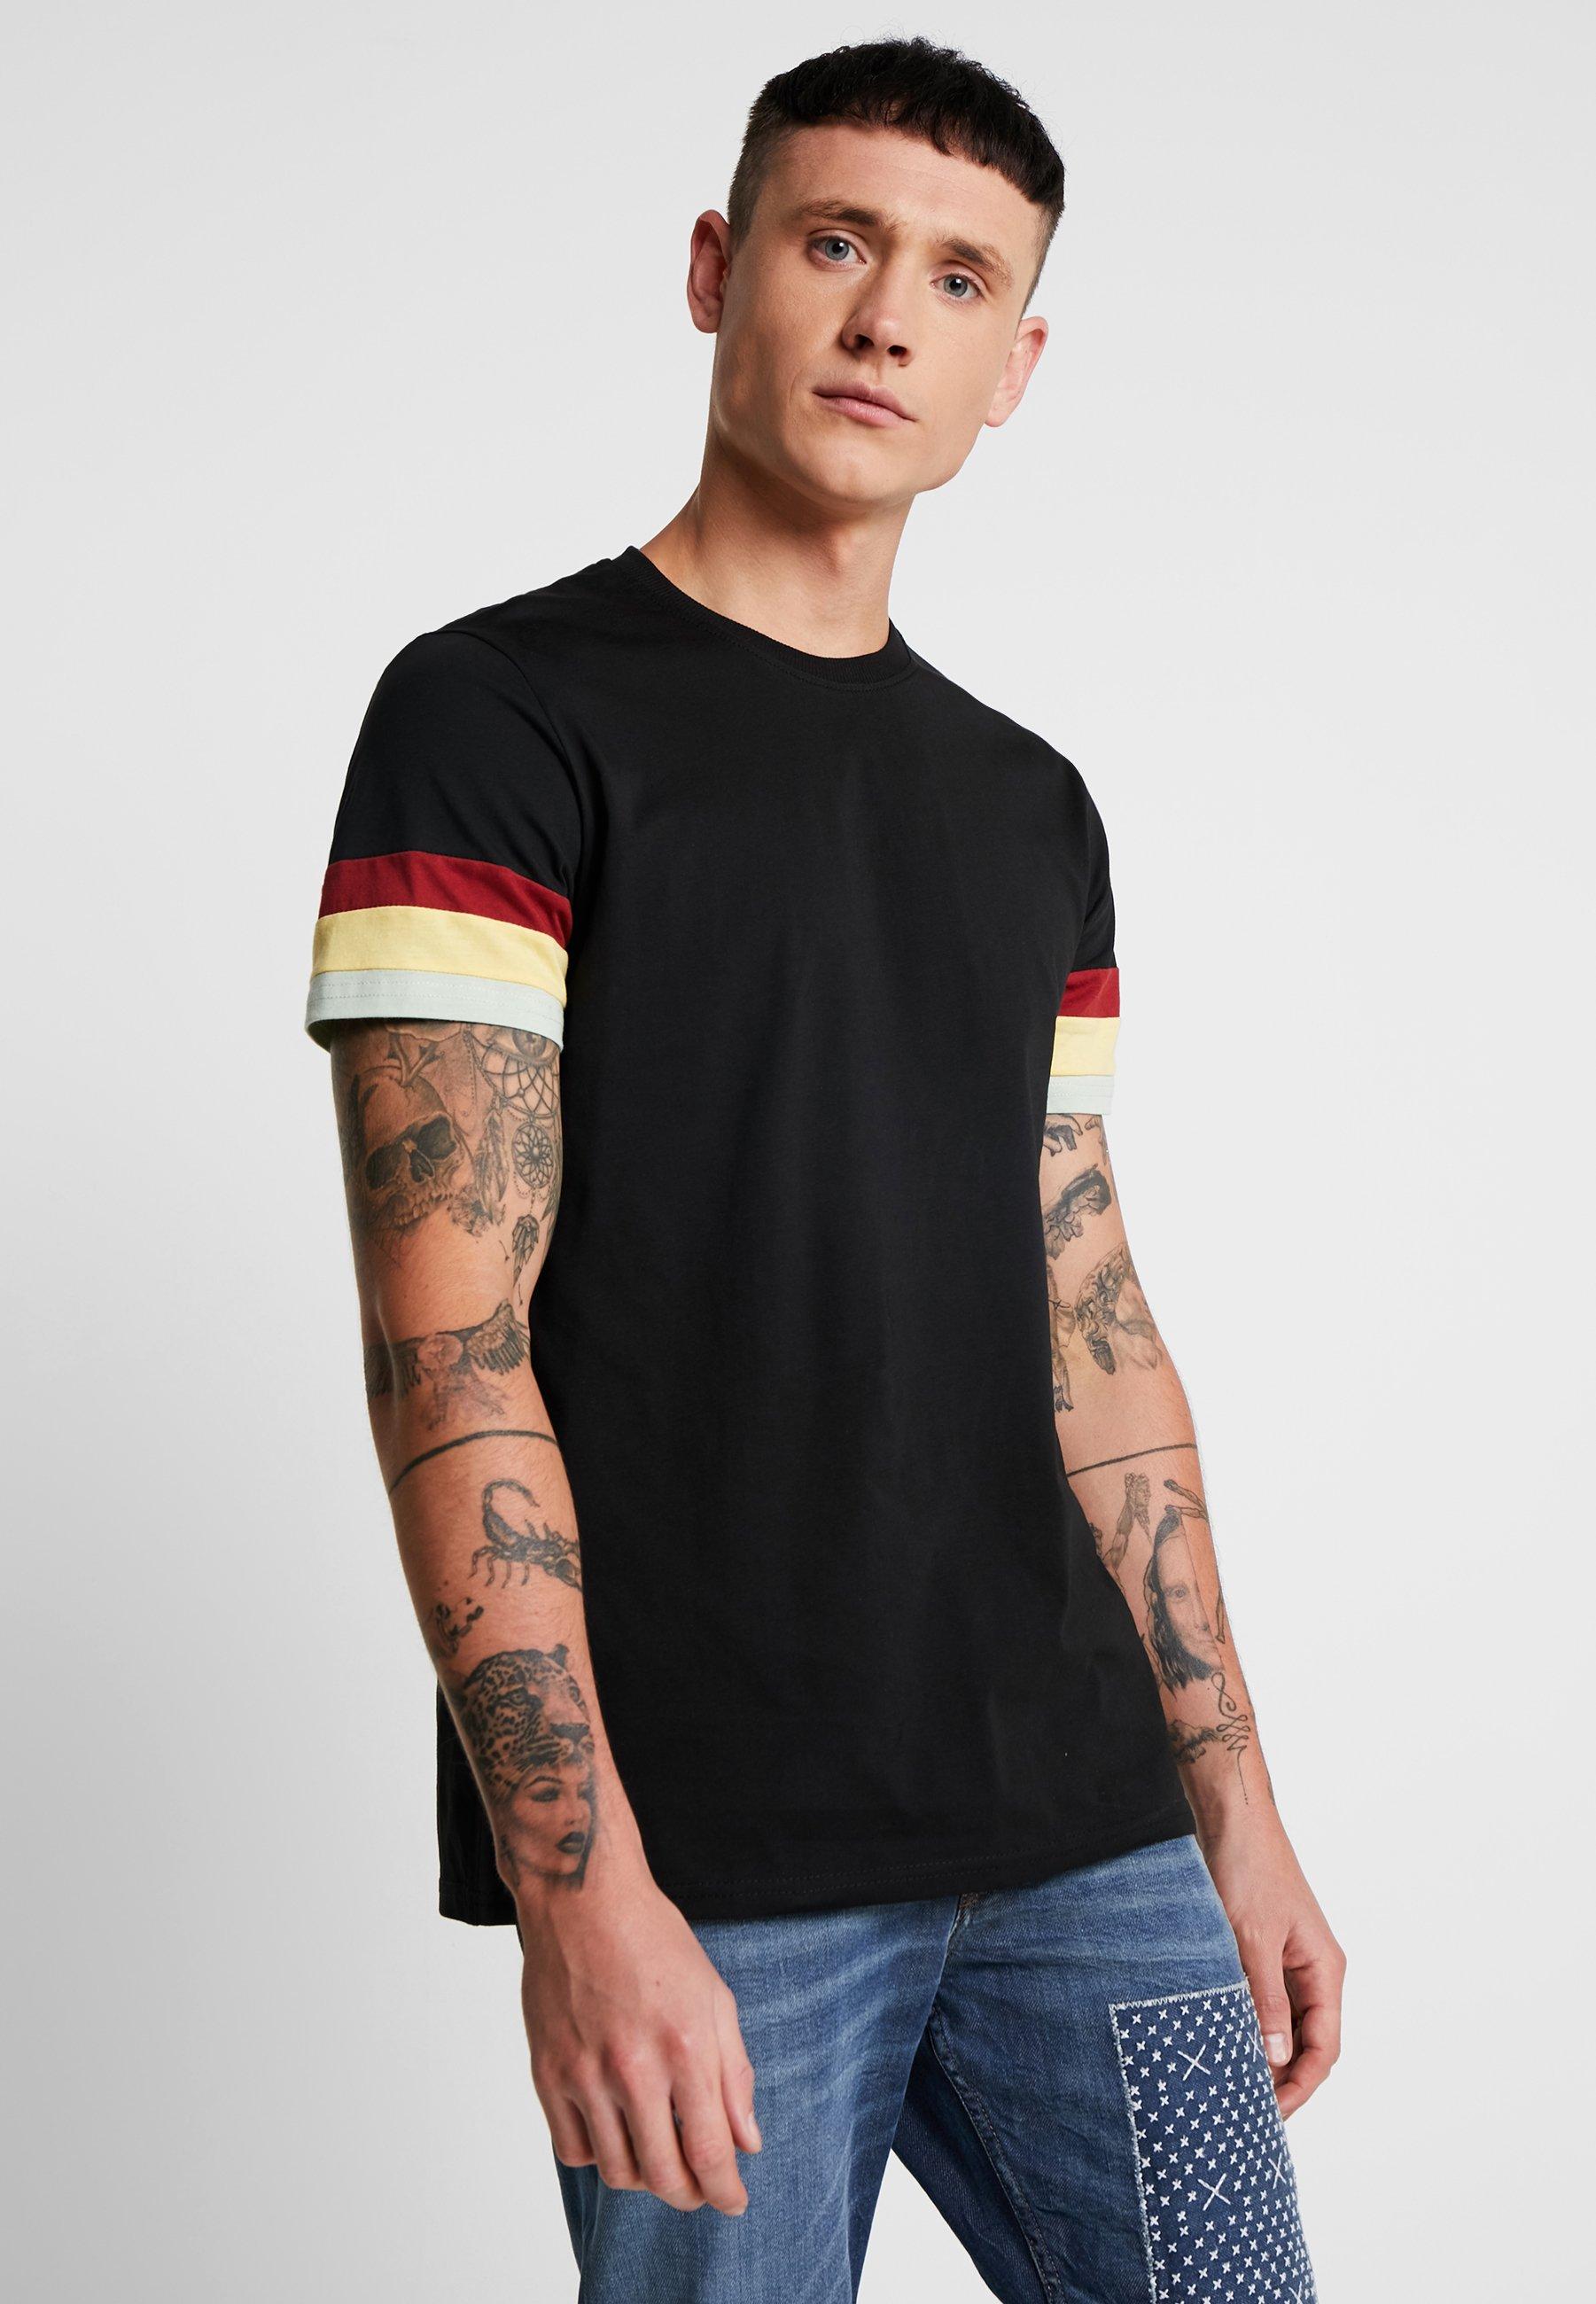 T shirt Yourturn BasiqueBlack T BasiqueBlack Yourturn T Yourturn shirt KJ1clF